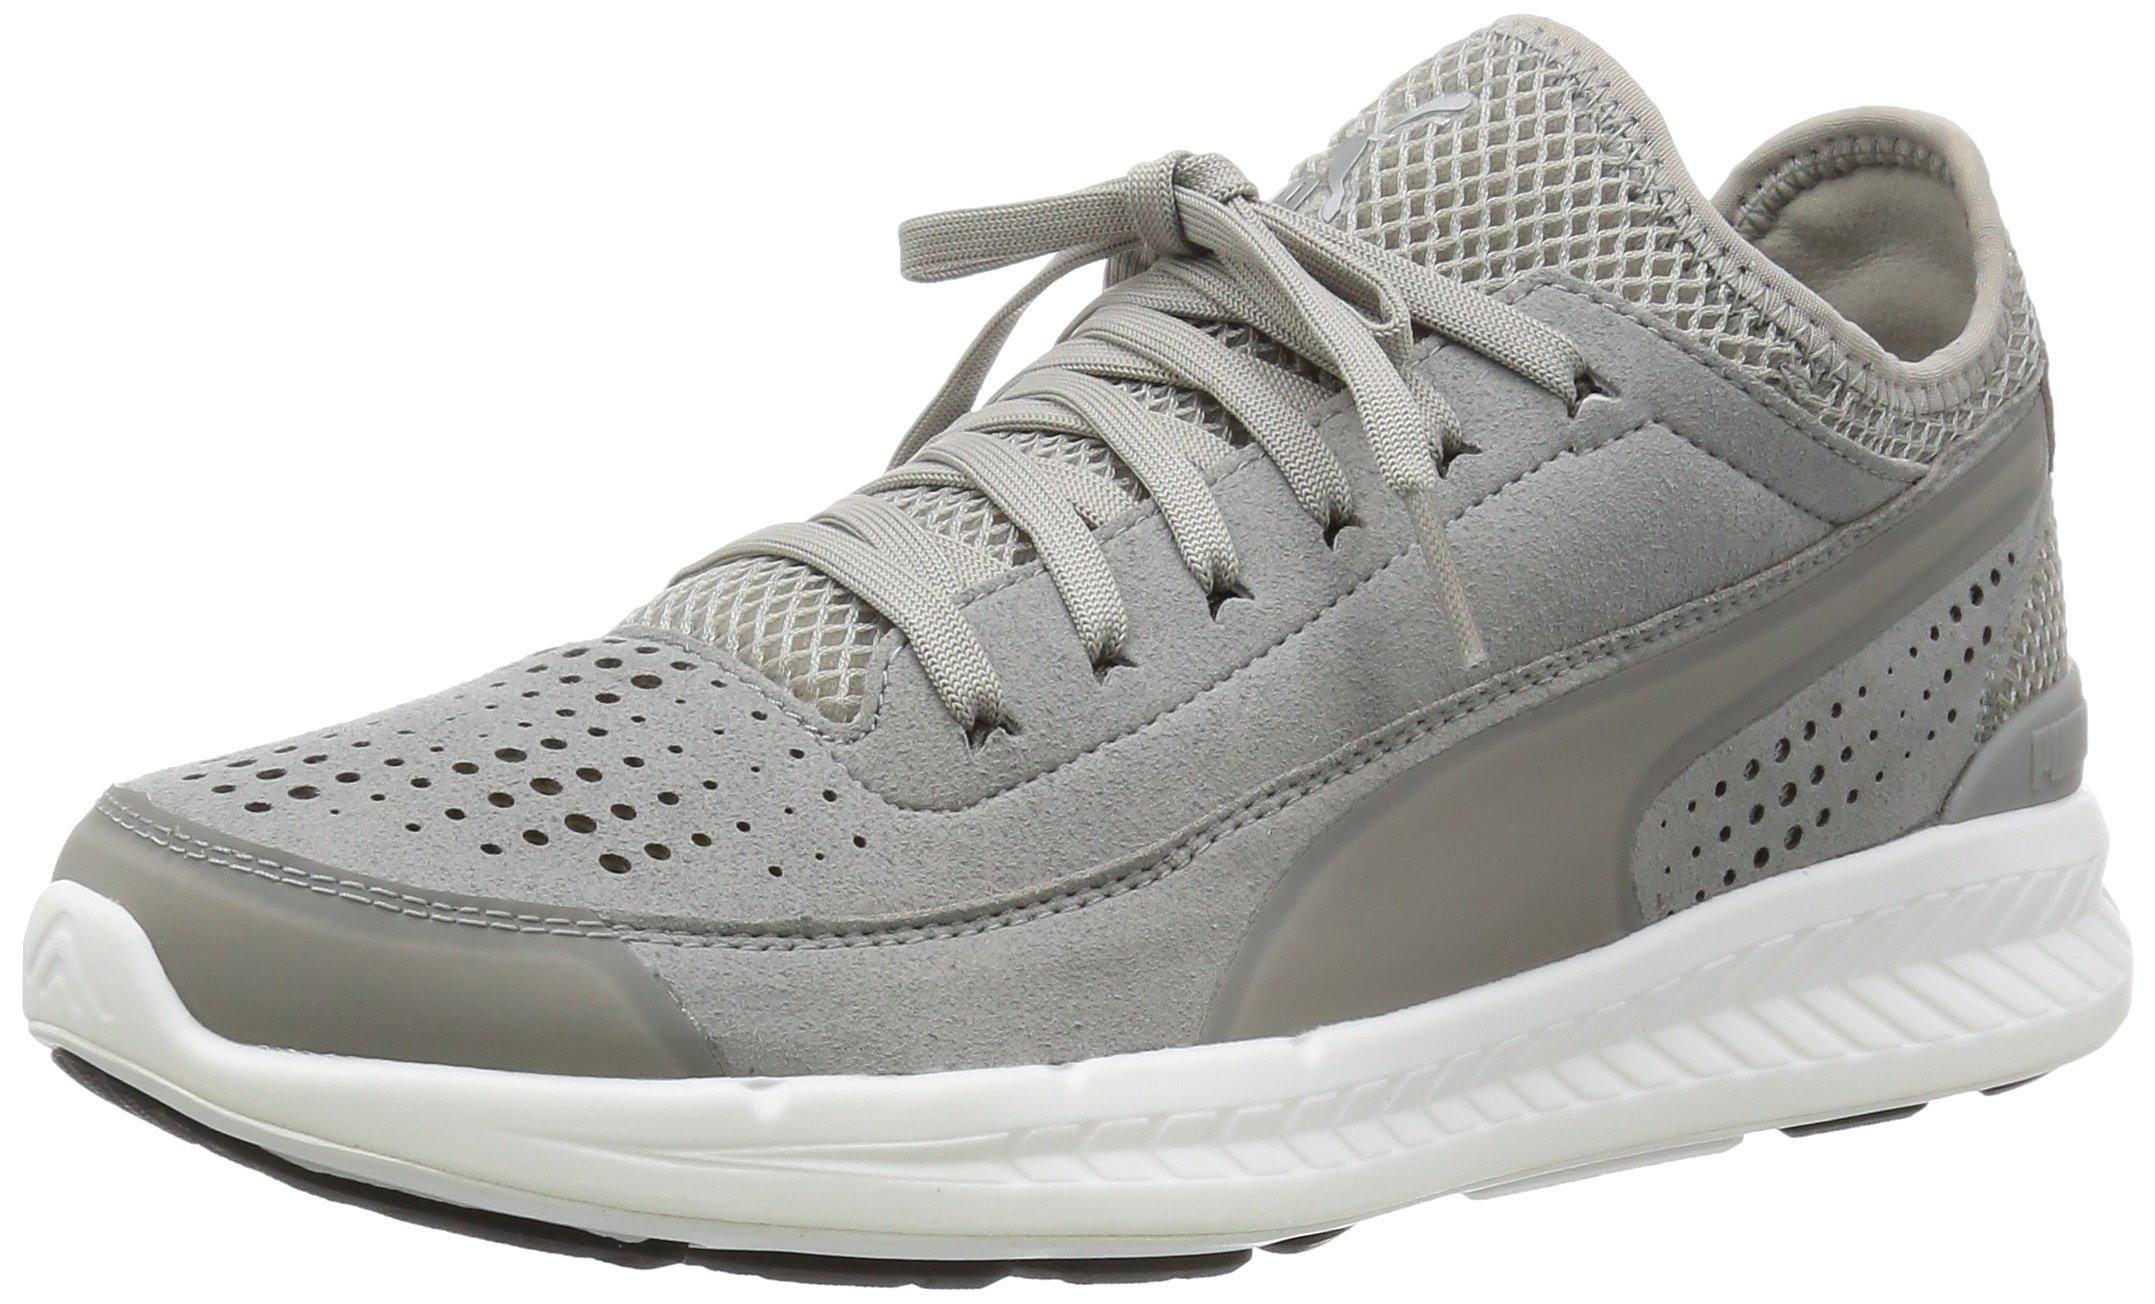 PUMA Ignite Sock Men Running Shoes Fitness Jogging 360570 02 grey, shoe size:EUR 42